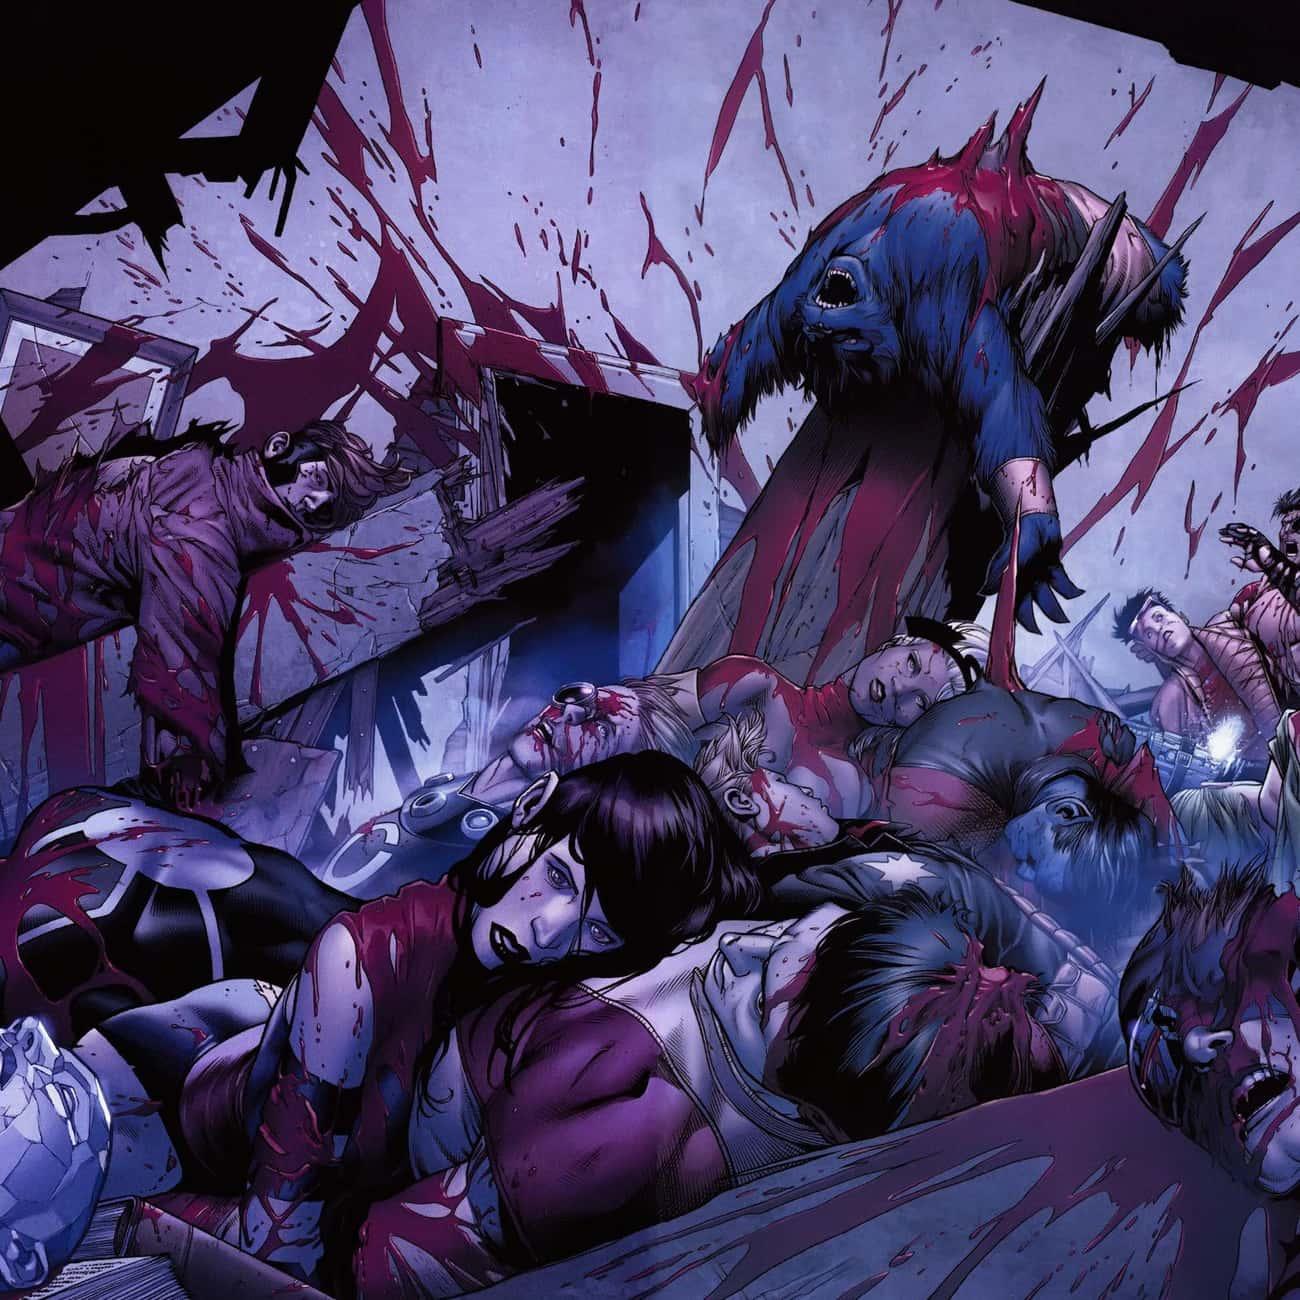 Old Man Logan Slaughtered The X-Men